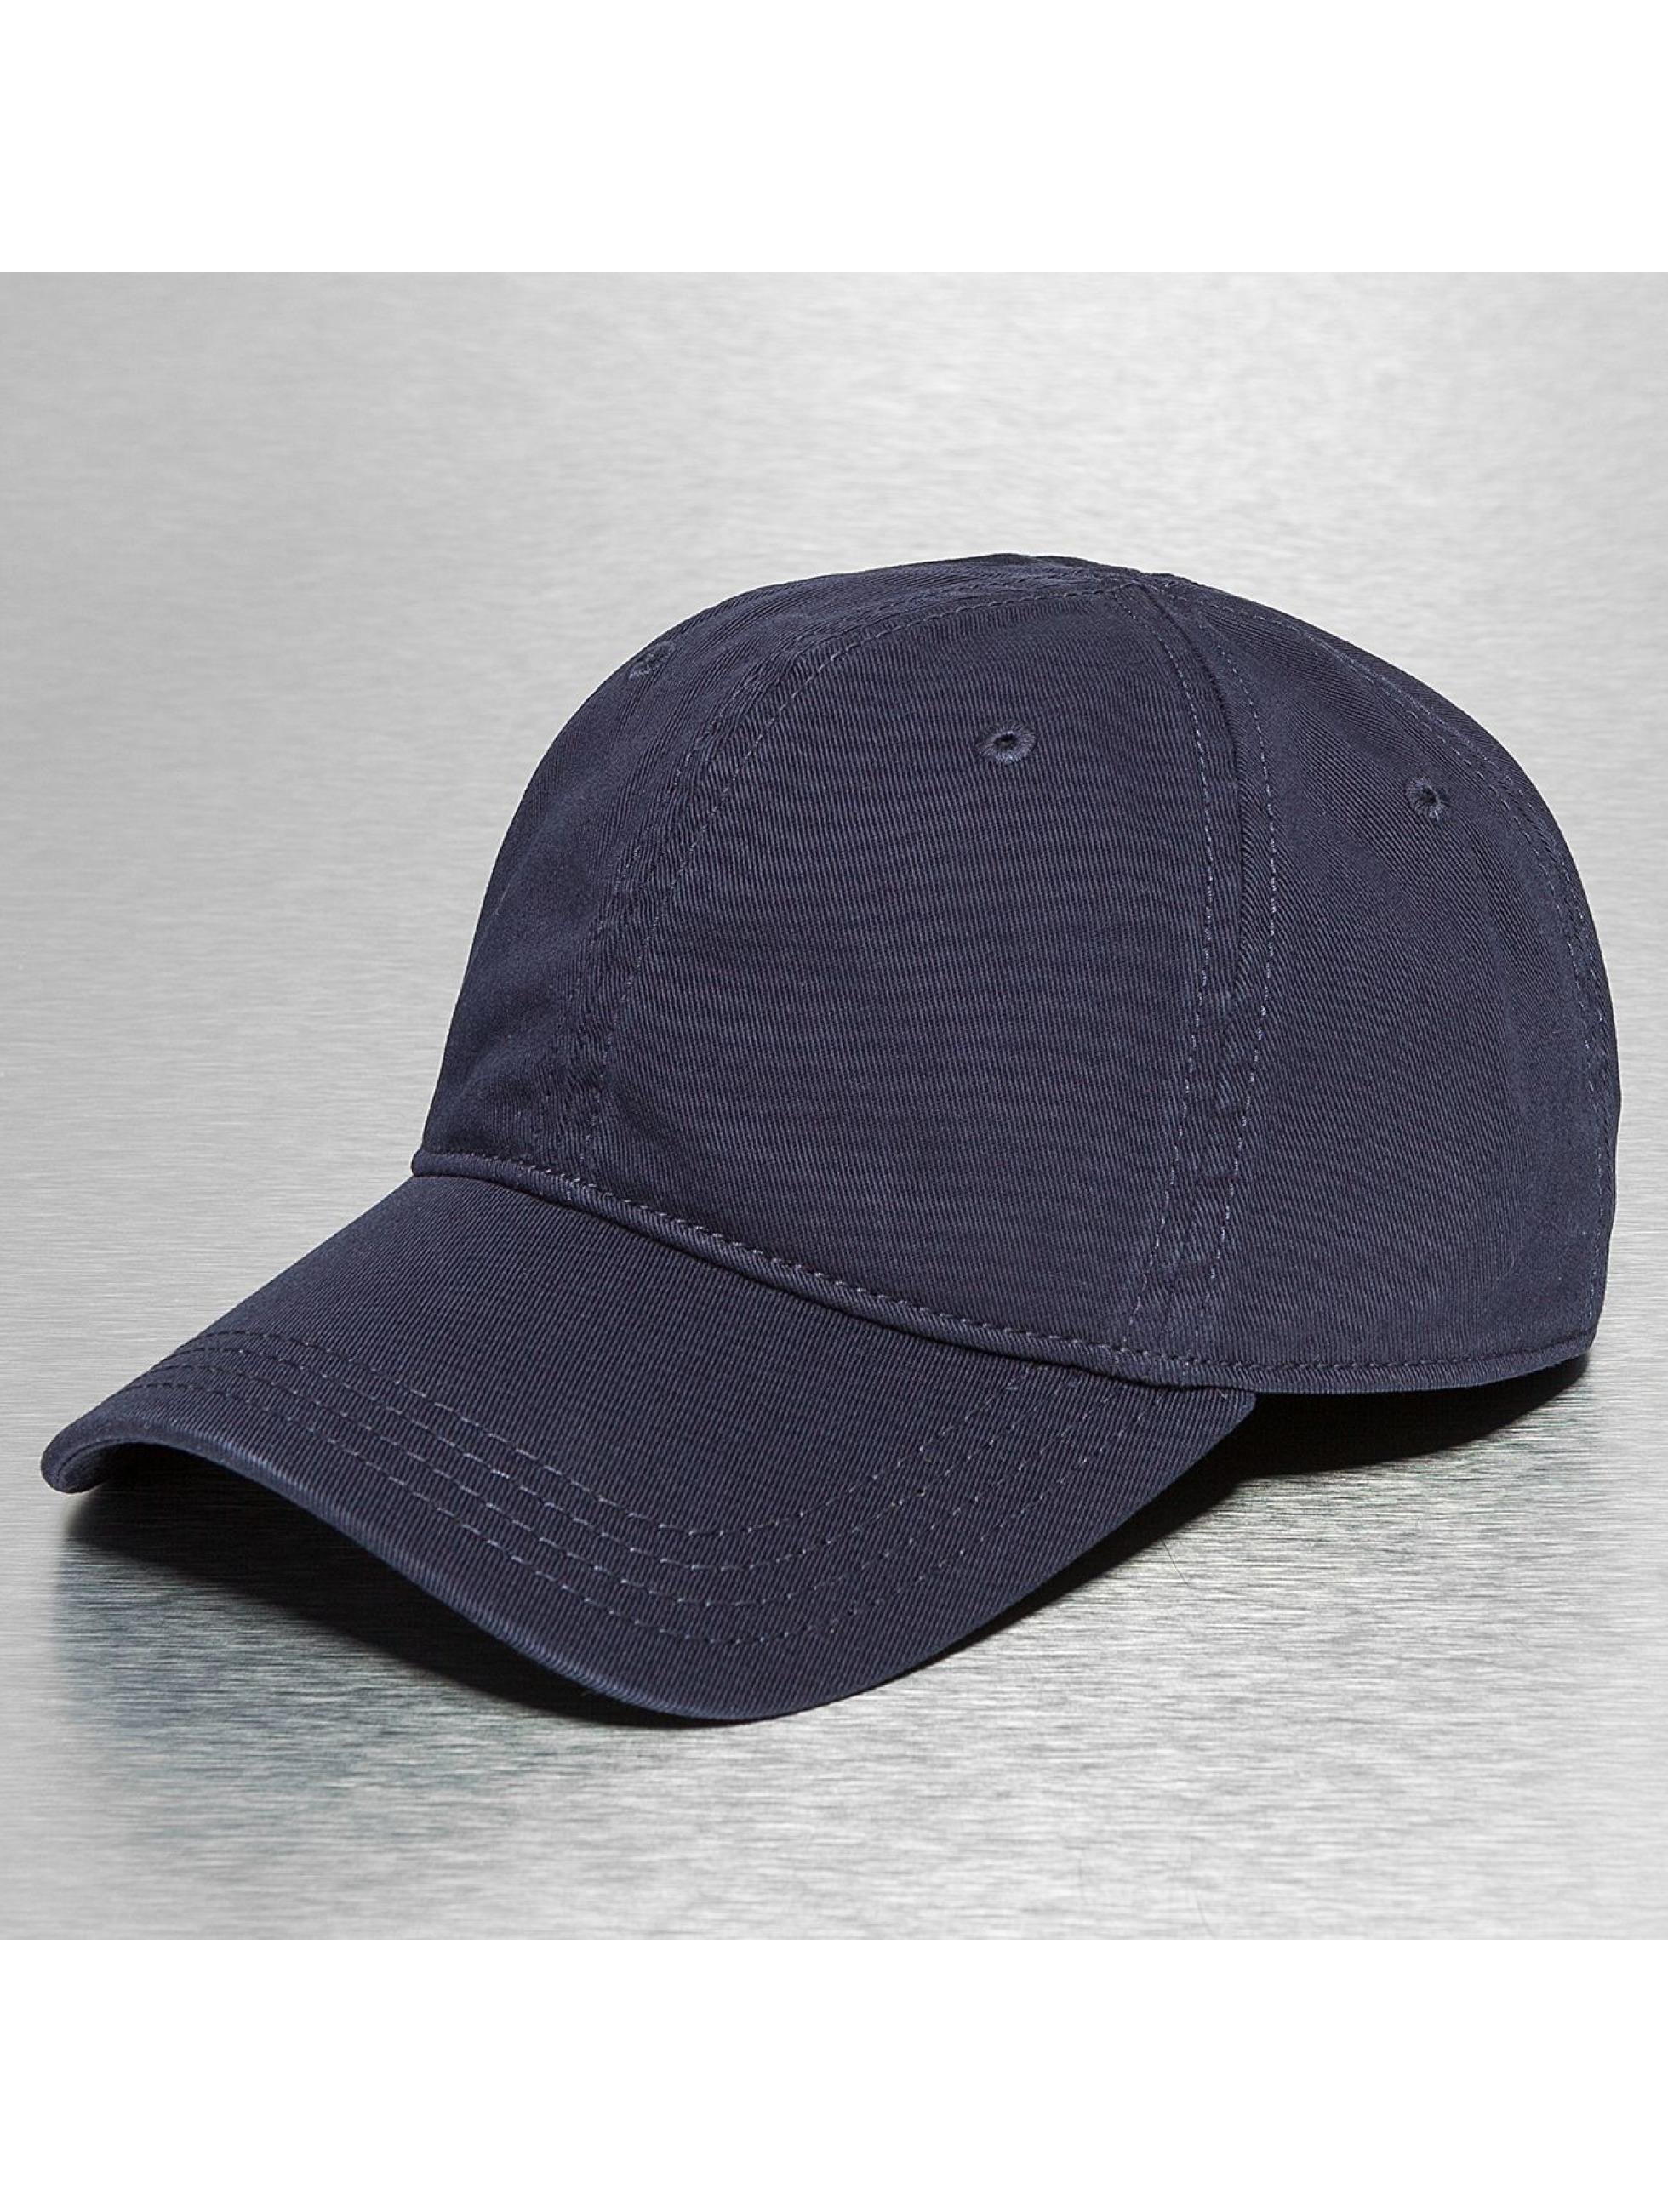 Lacoste Classic Кепка с застёжкой Gabardine Croc Strapback Cap синий